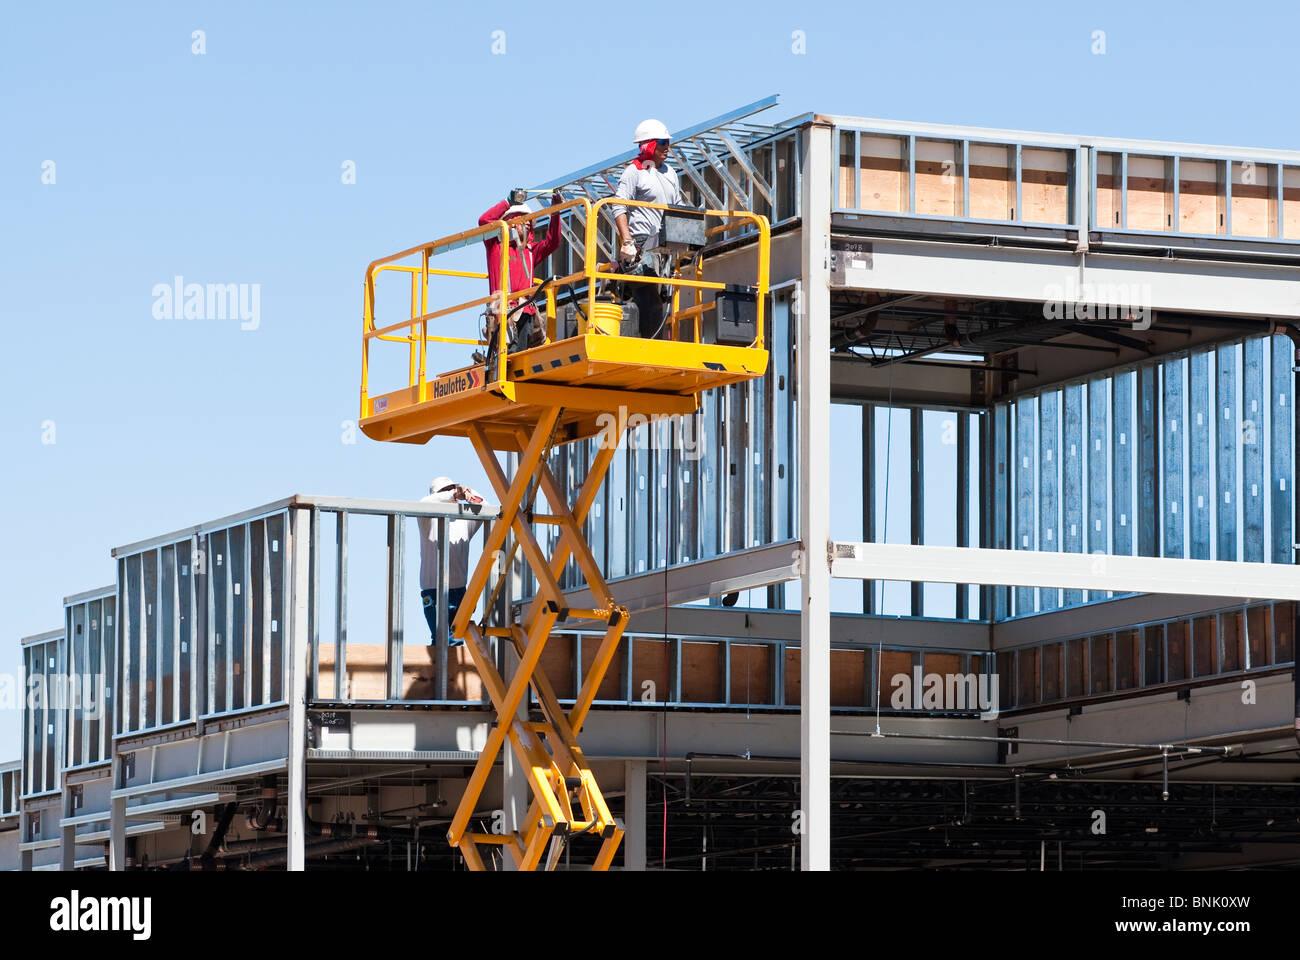 Home | Manson Construction Co.